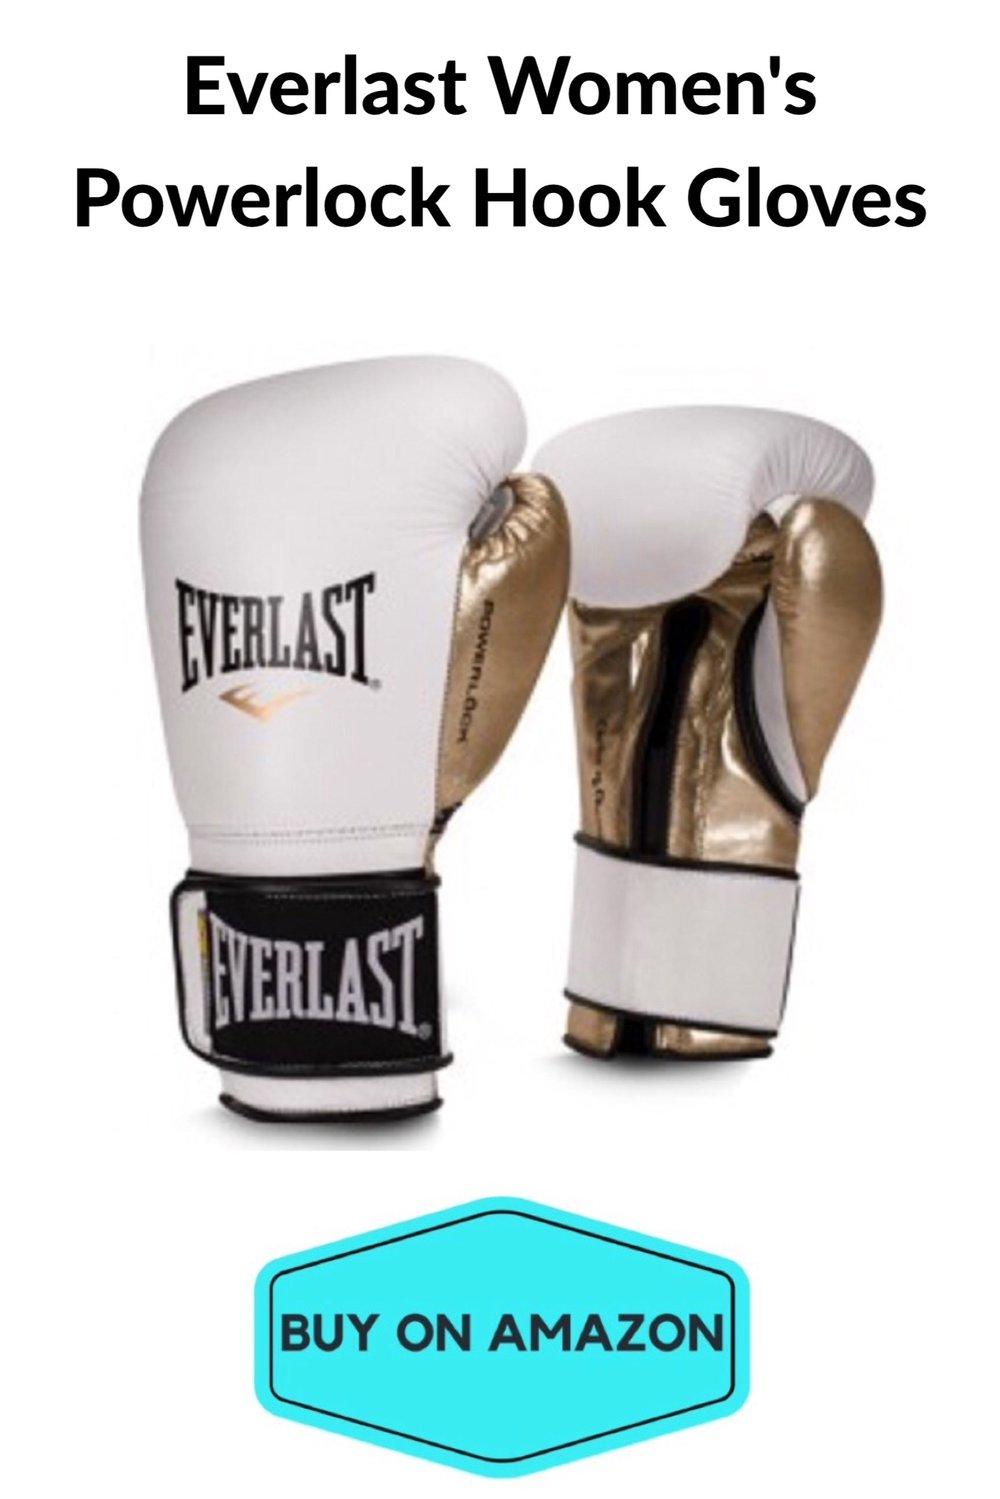 Everlast Women's Powerlock Hook Gloves